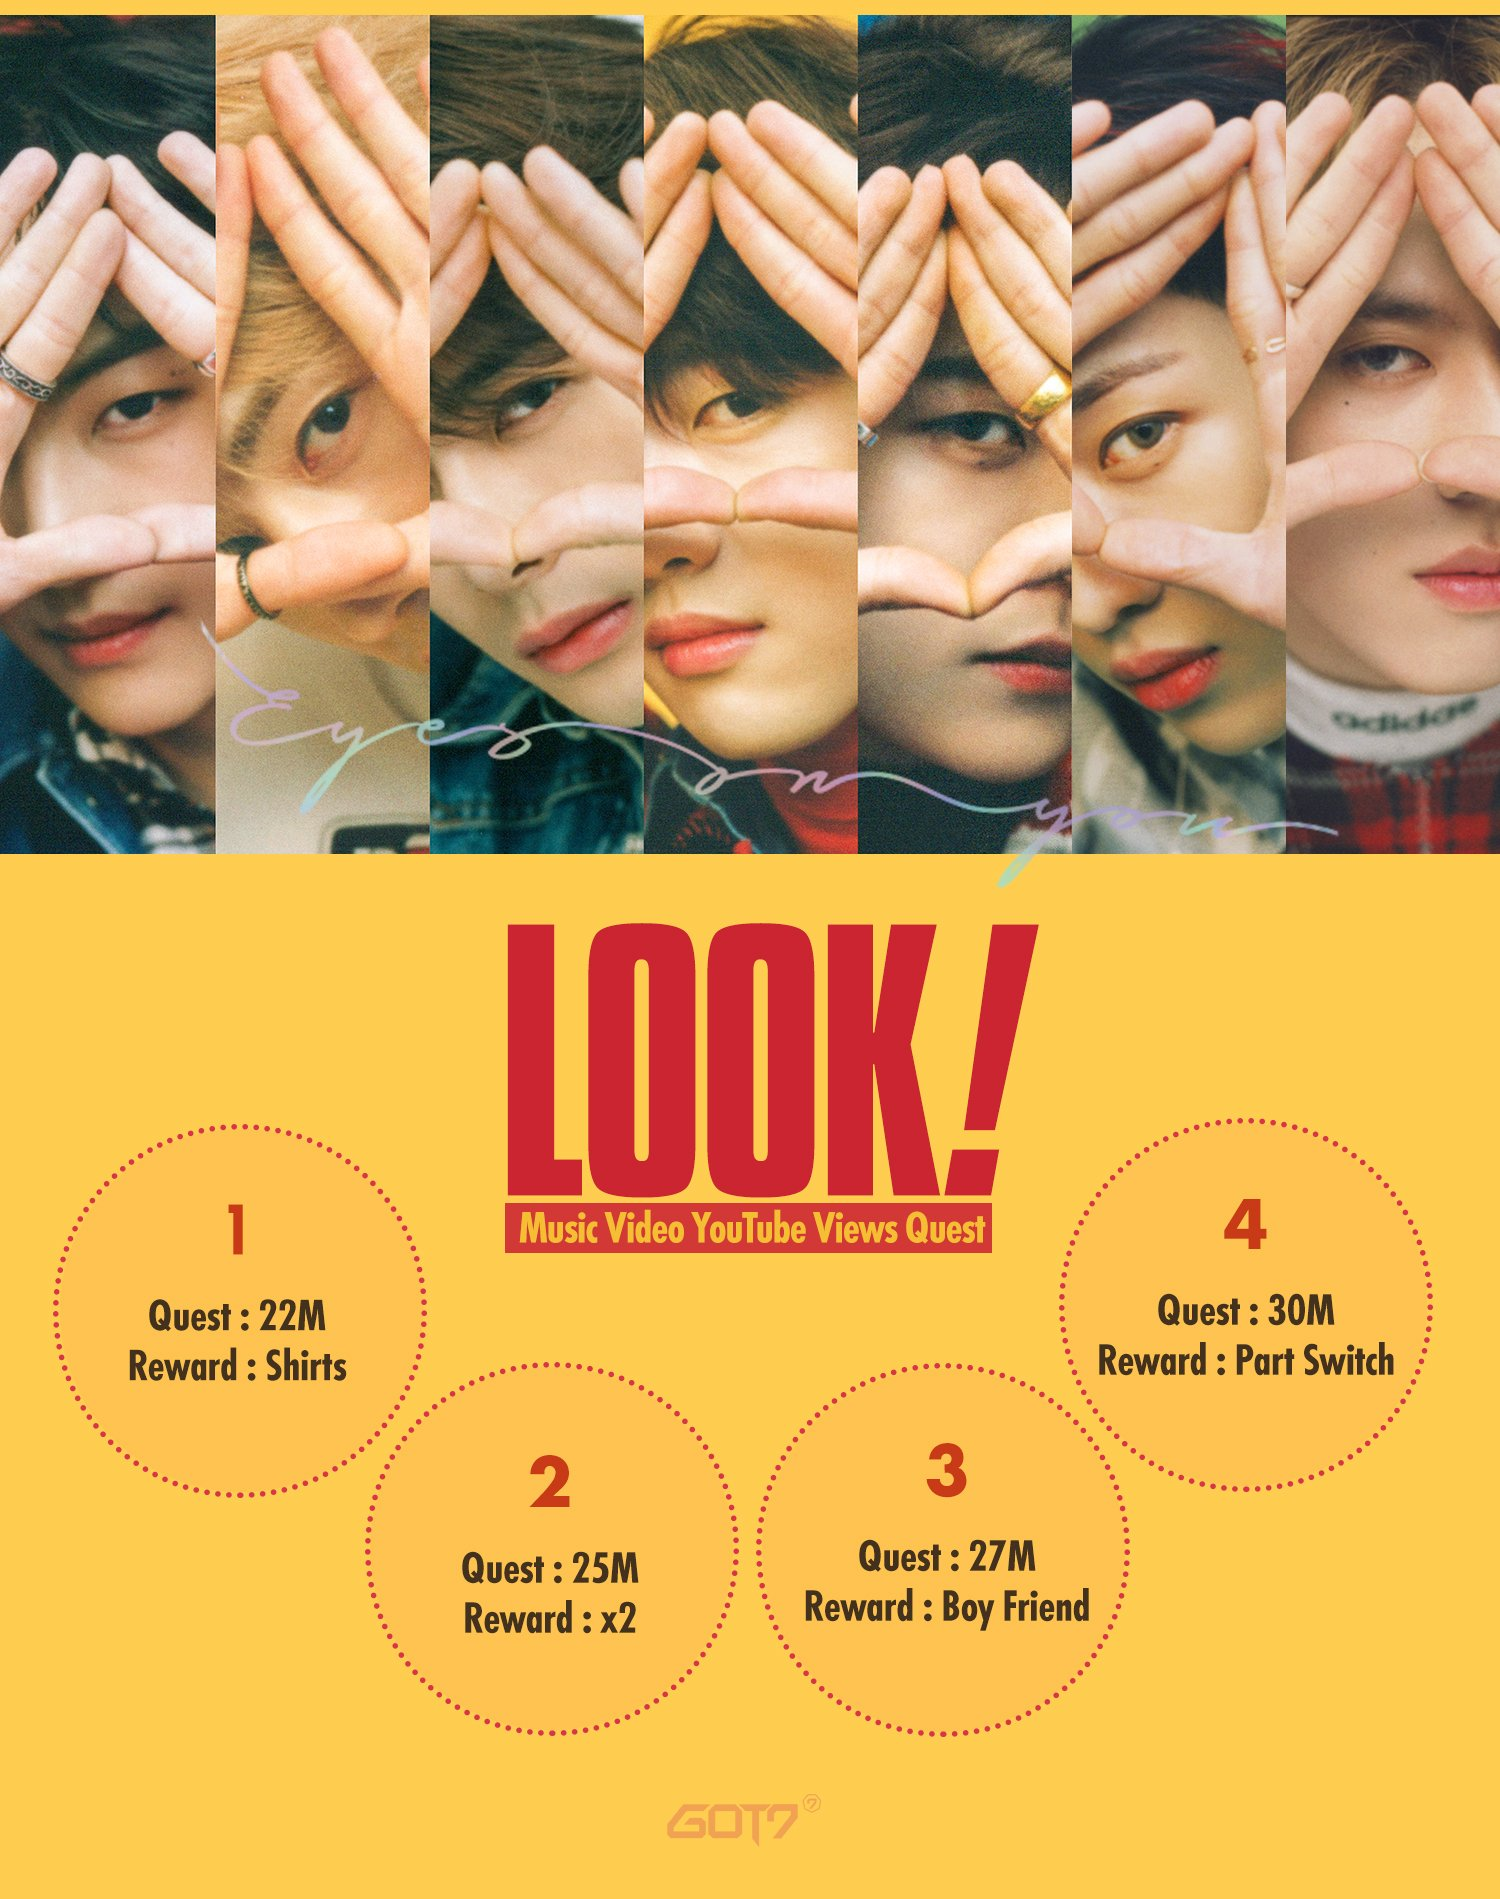 'Look' →ᆴᄂ↓ᄃチ→ᄍト→ヤヤ↓リᄂ ↓ワᅠ■ネᆲ→ᄌフ ↓ᄀᄚ■レフ↓ネリ ■タリ↓ハᄂ■ハᄌ Quest for 'Look' Music Video YouTube Views  #GOT7 #↑ᄚモ↓トᄌ→ᄌミ #EyesOnYou #Look #MVQuest https://t.co/1CjIIiyeyY